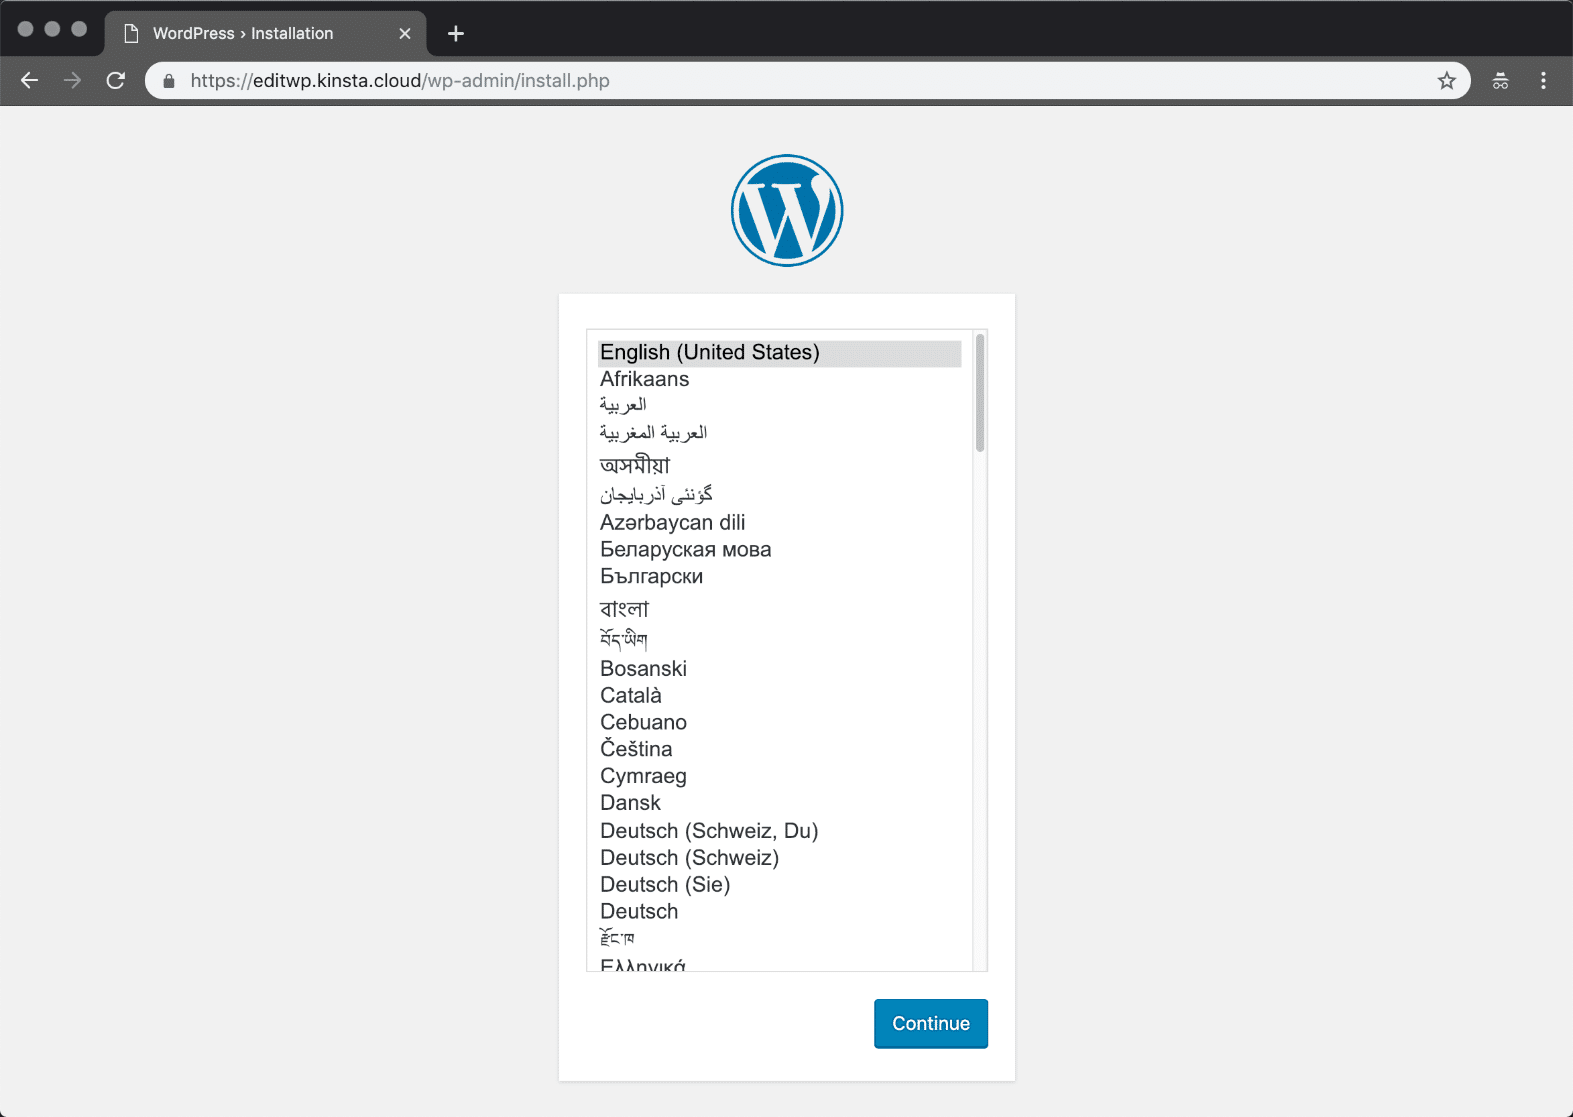 Langue d'installation de WordPress